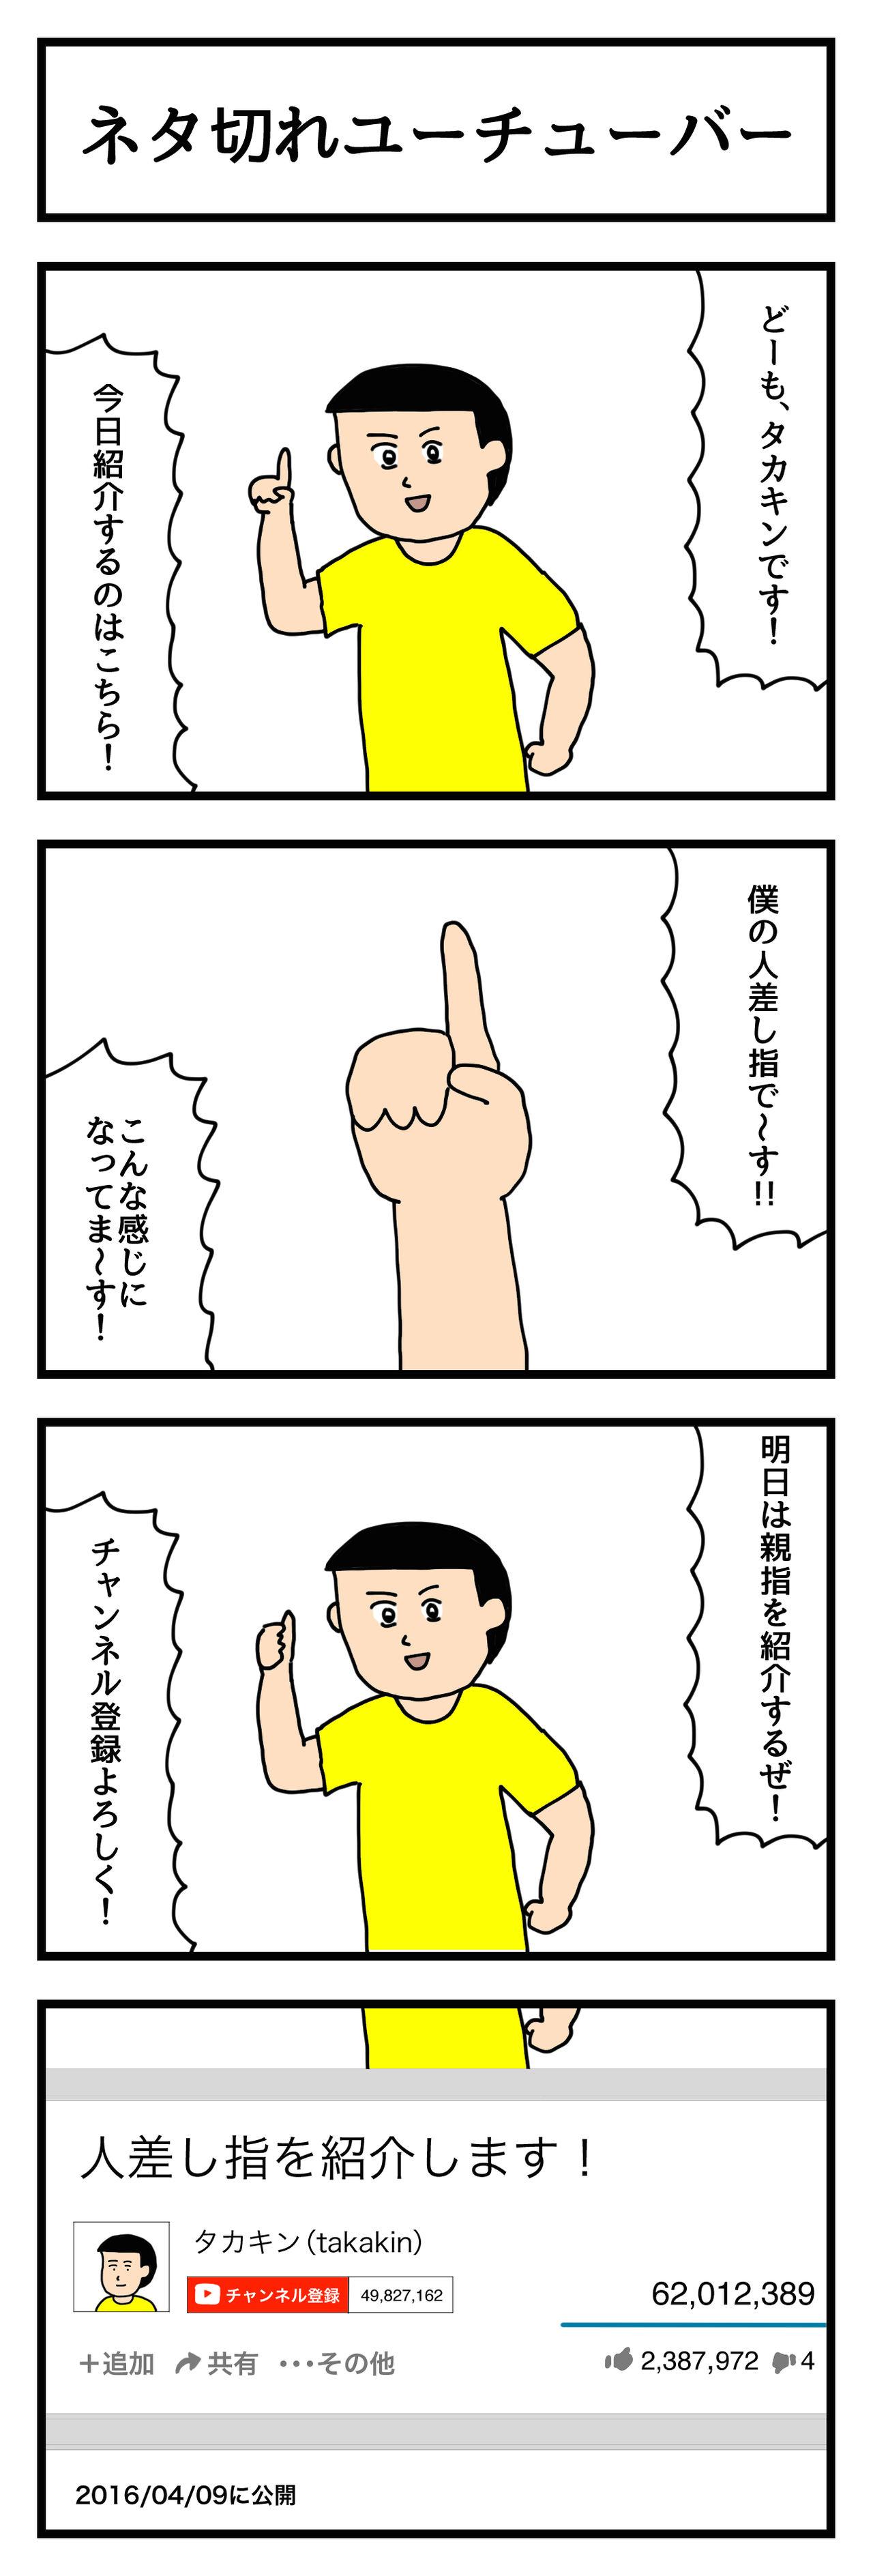 四 コマ 漫画 ネタ 四 コマ 漫画 ネタ ...